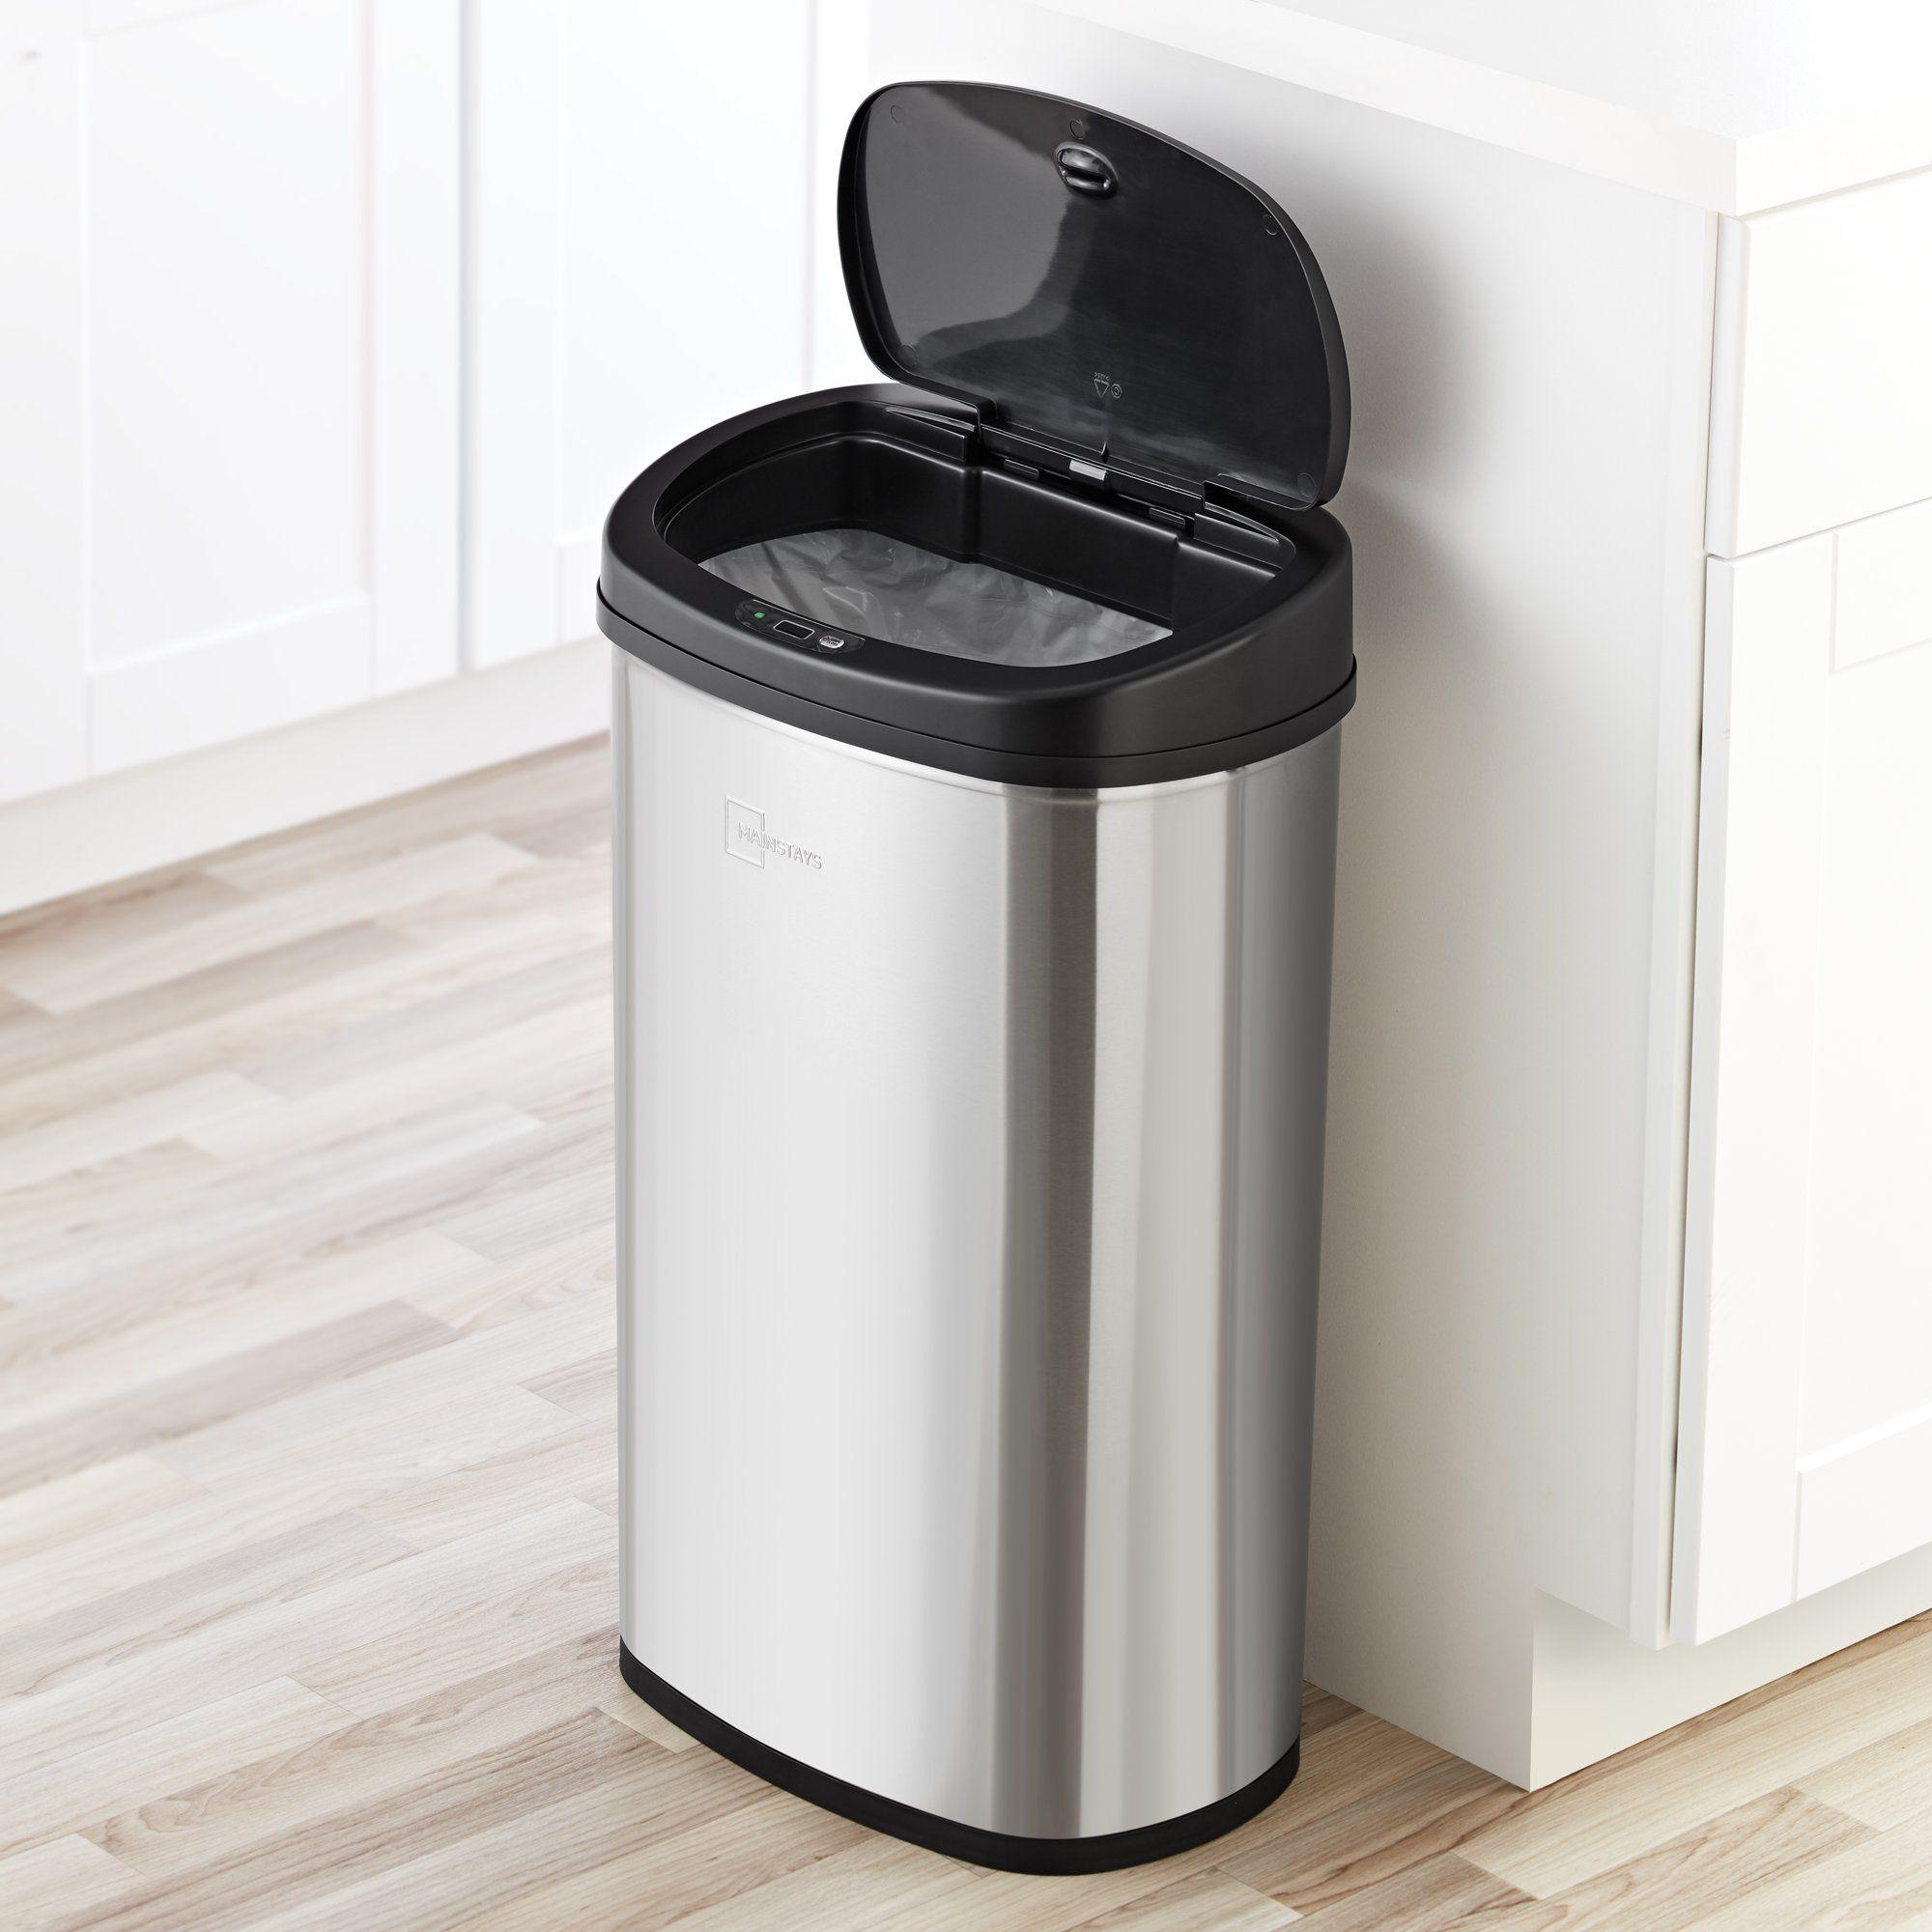 Mainstays Motion Sensor Wastebasket Can 13 2 Gallon Stainless Steel Kitchen Walmart Com In 2021 Trash Can Kitchen Trash Cans Garbage Bin